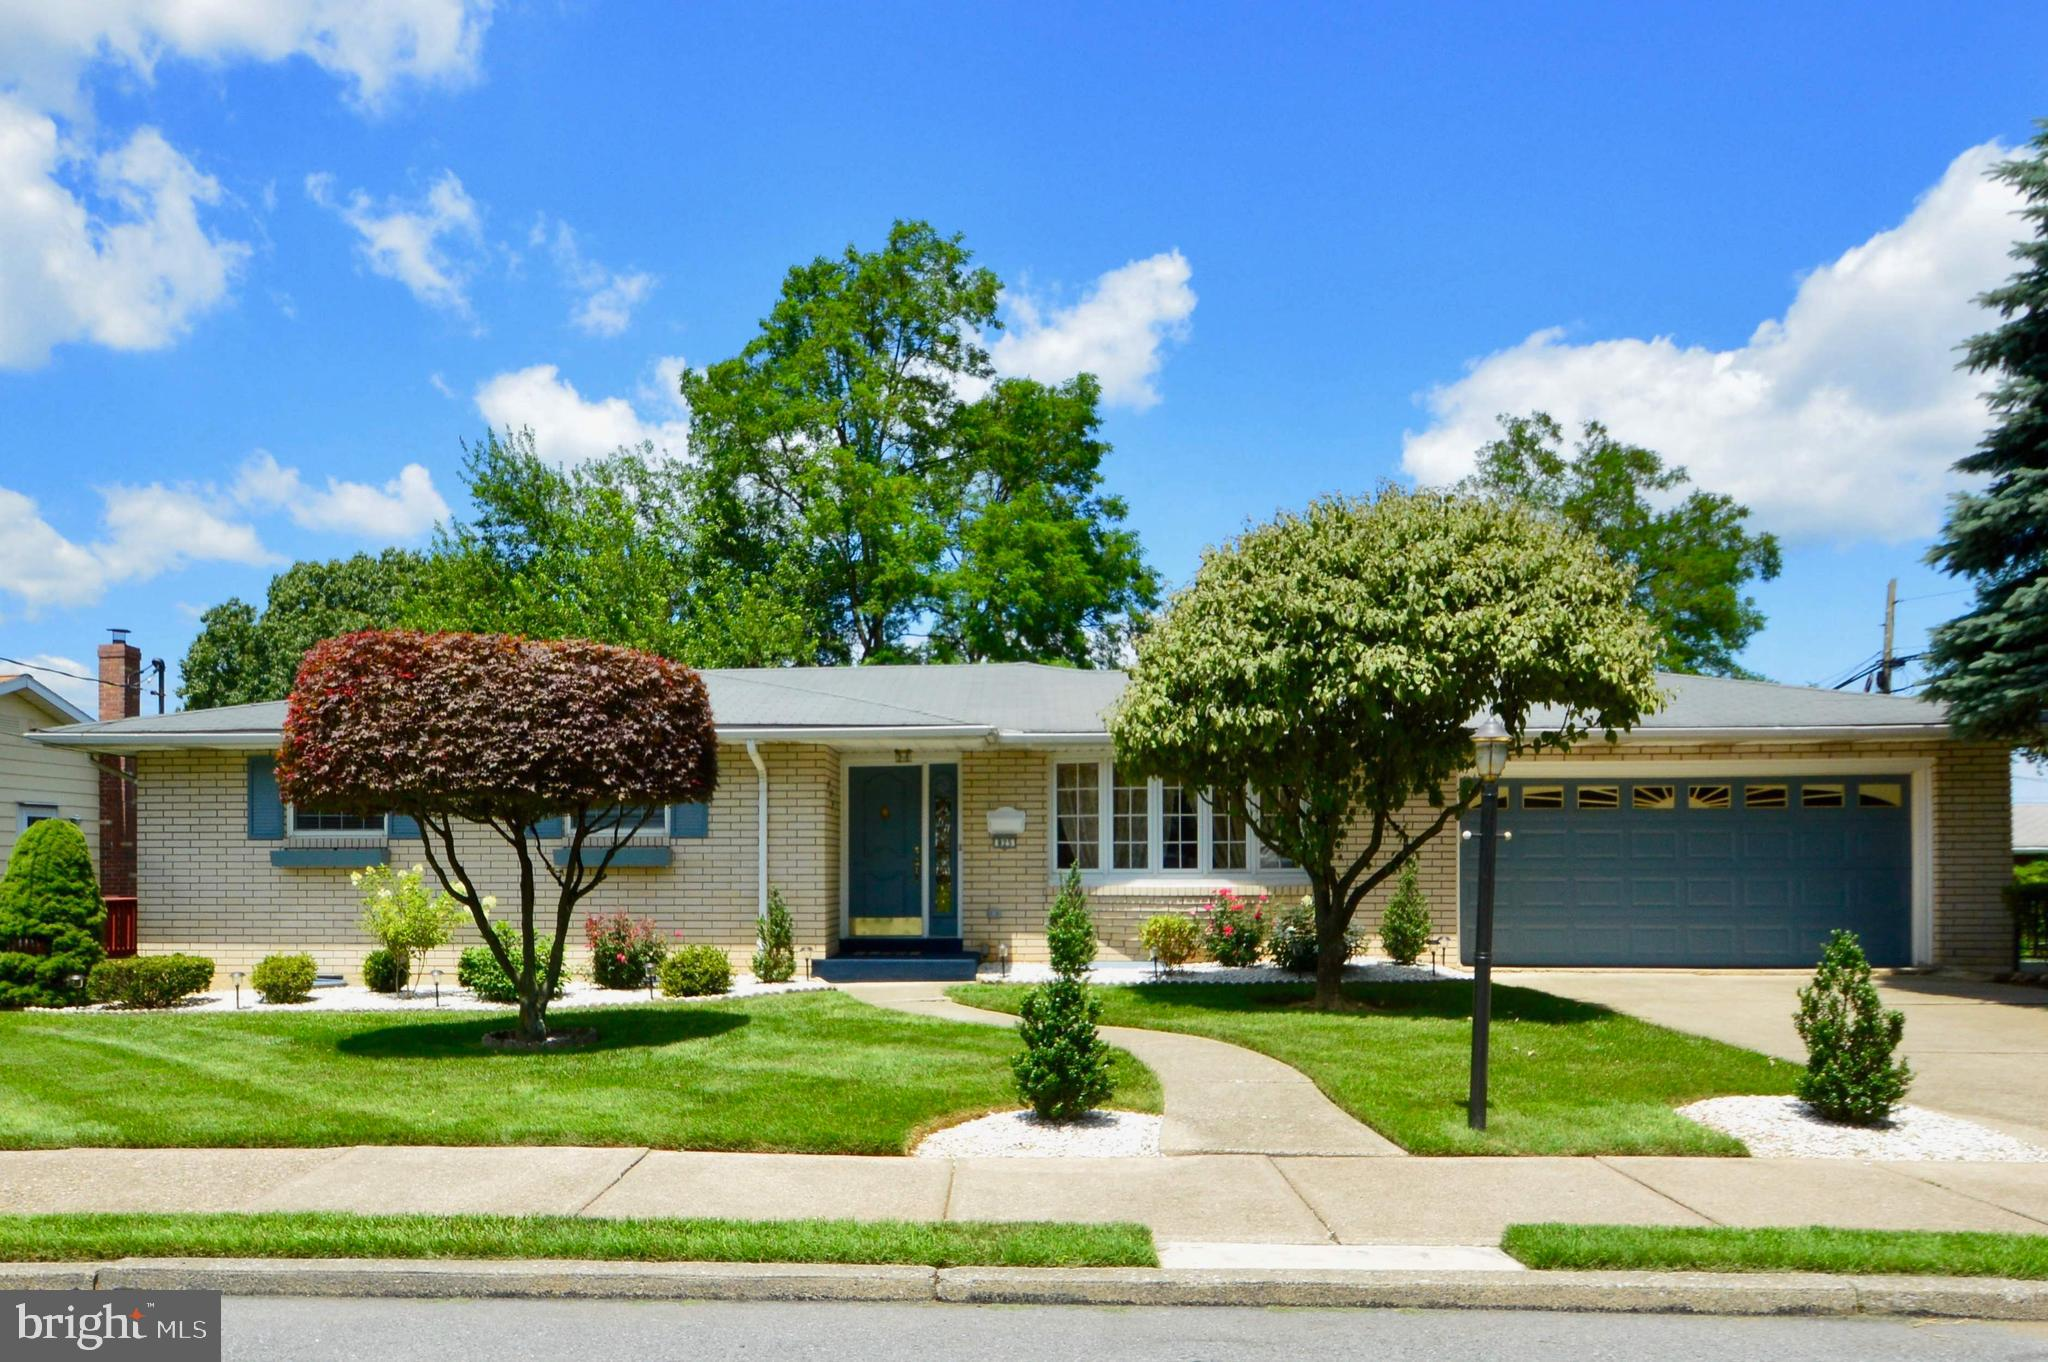 825 W CHEW STREET E, ALLENTOWN, PA 18109